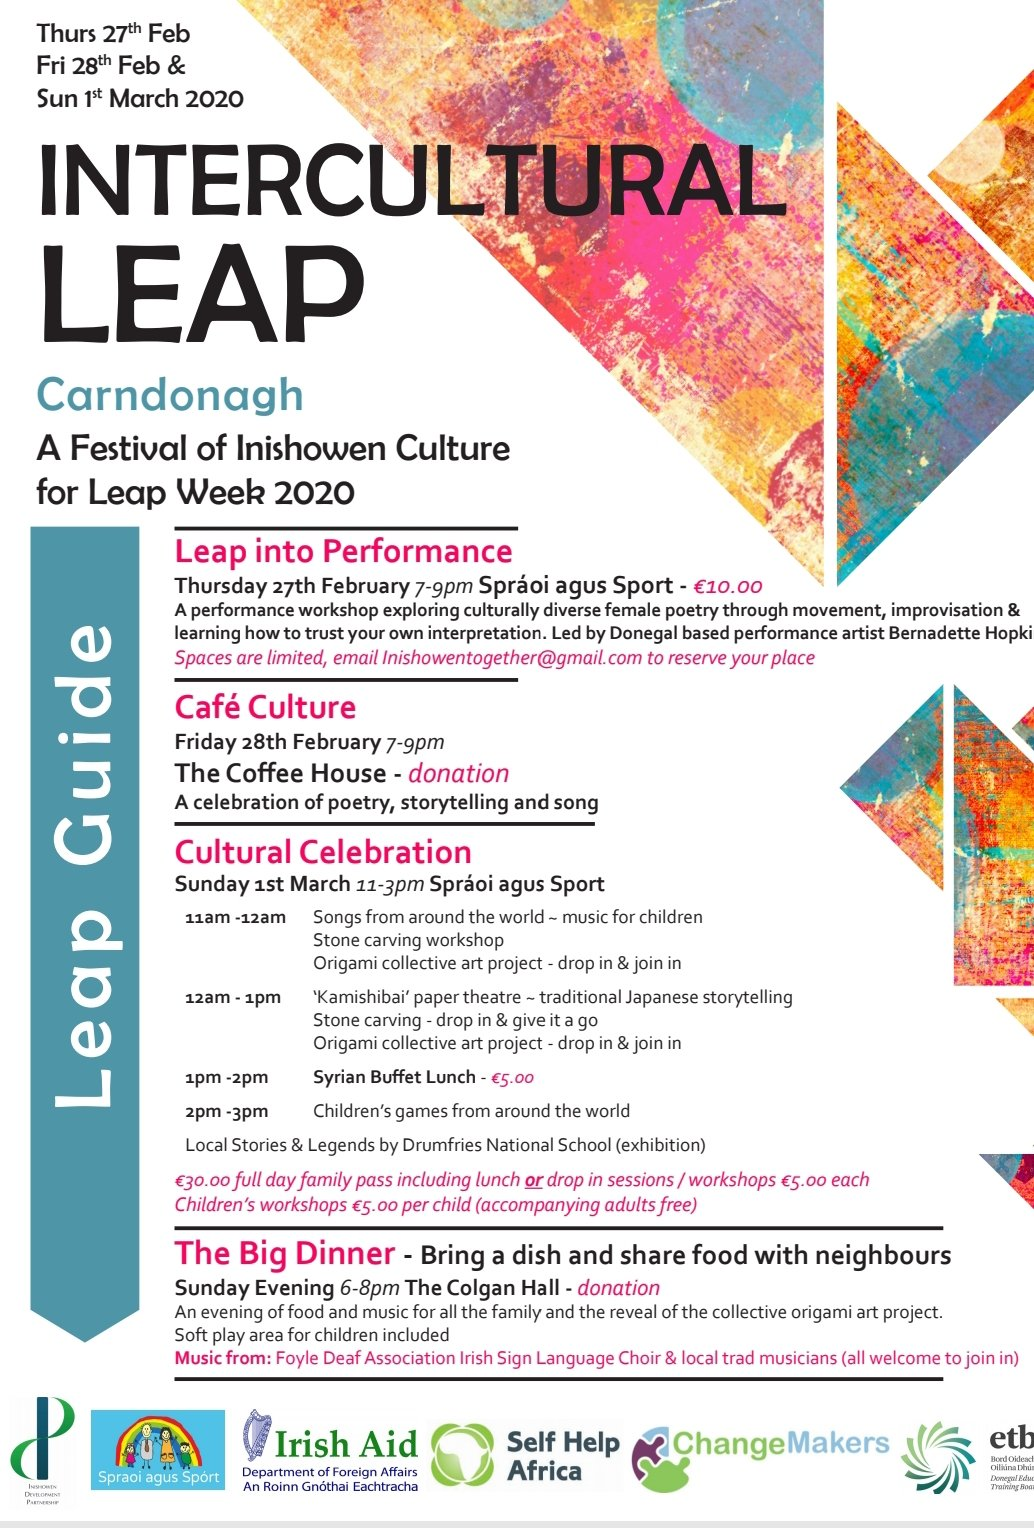 Intercultural Leap Festival